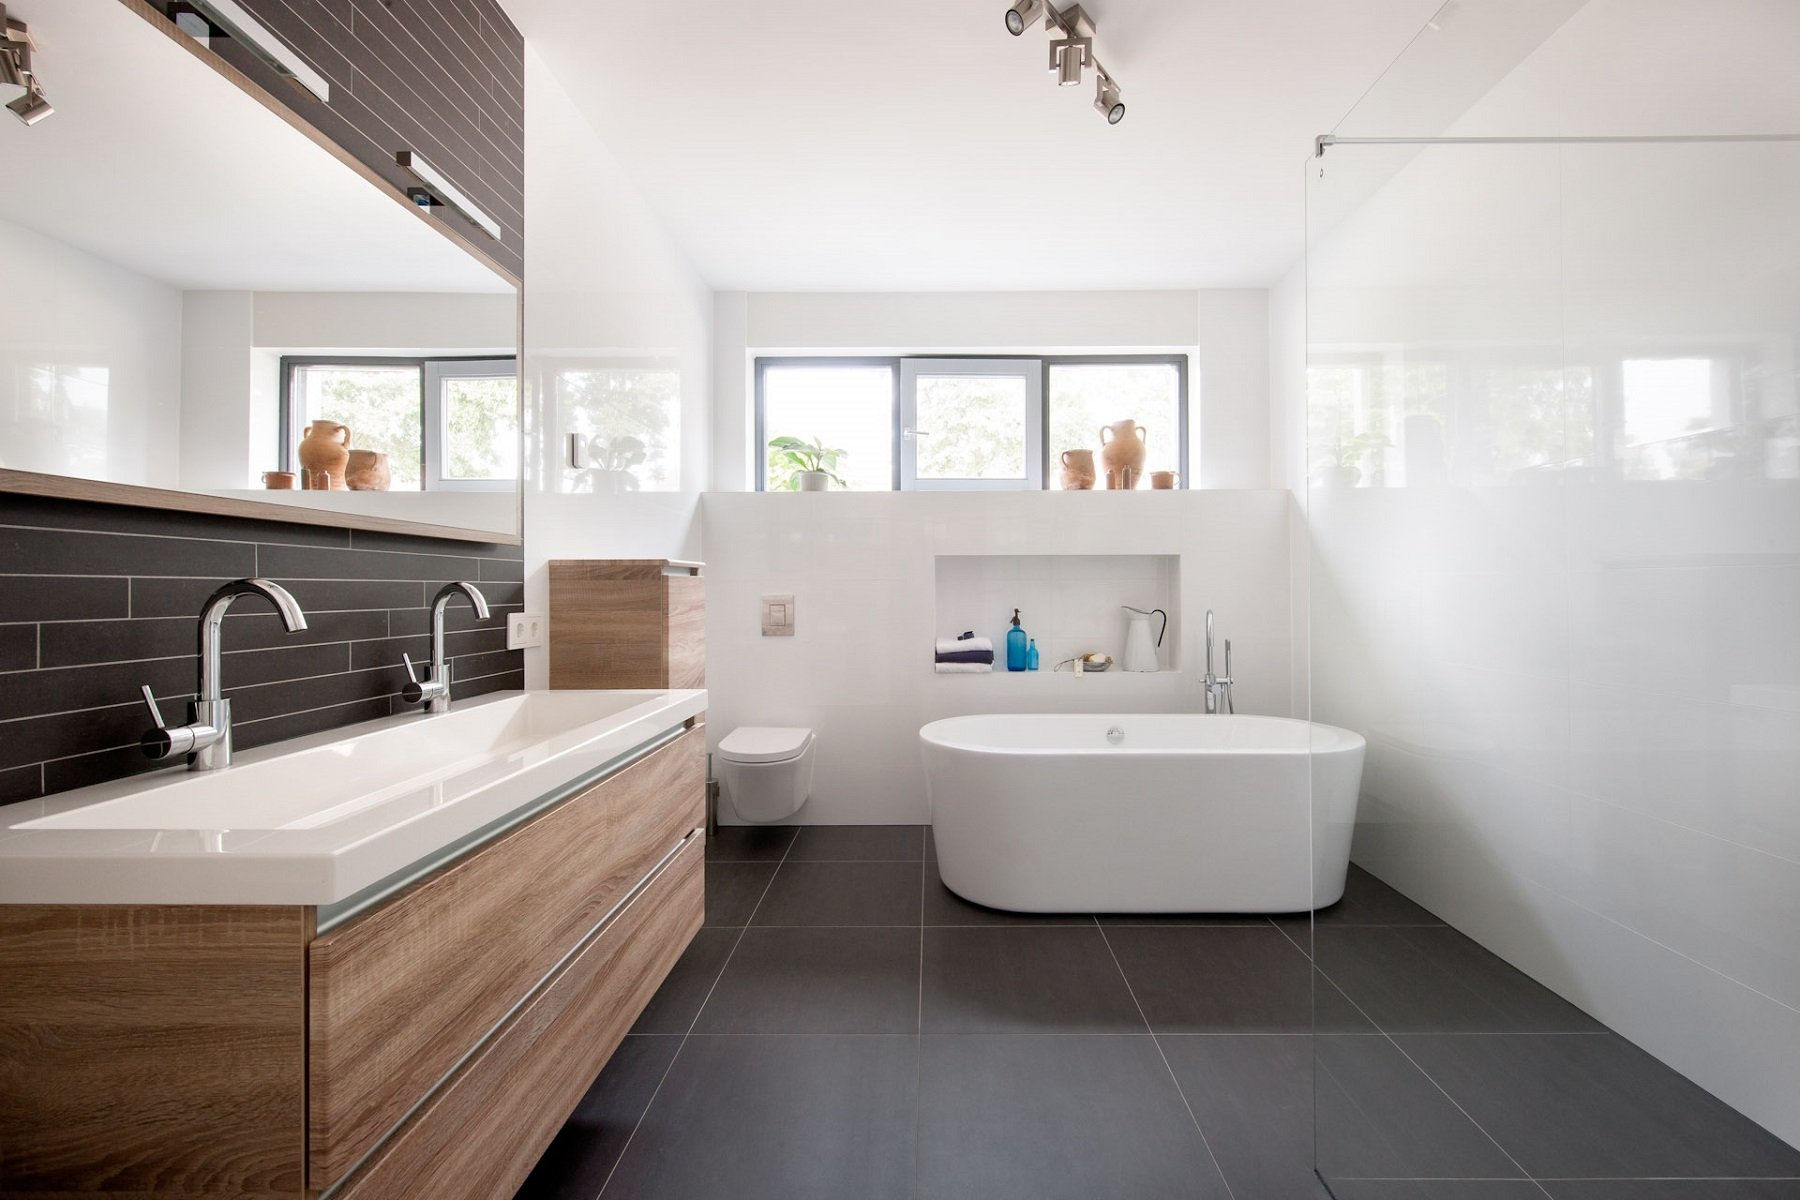 Keuken Badkamer Vloeren : Keuken badkamer tegels